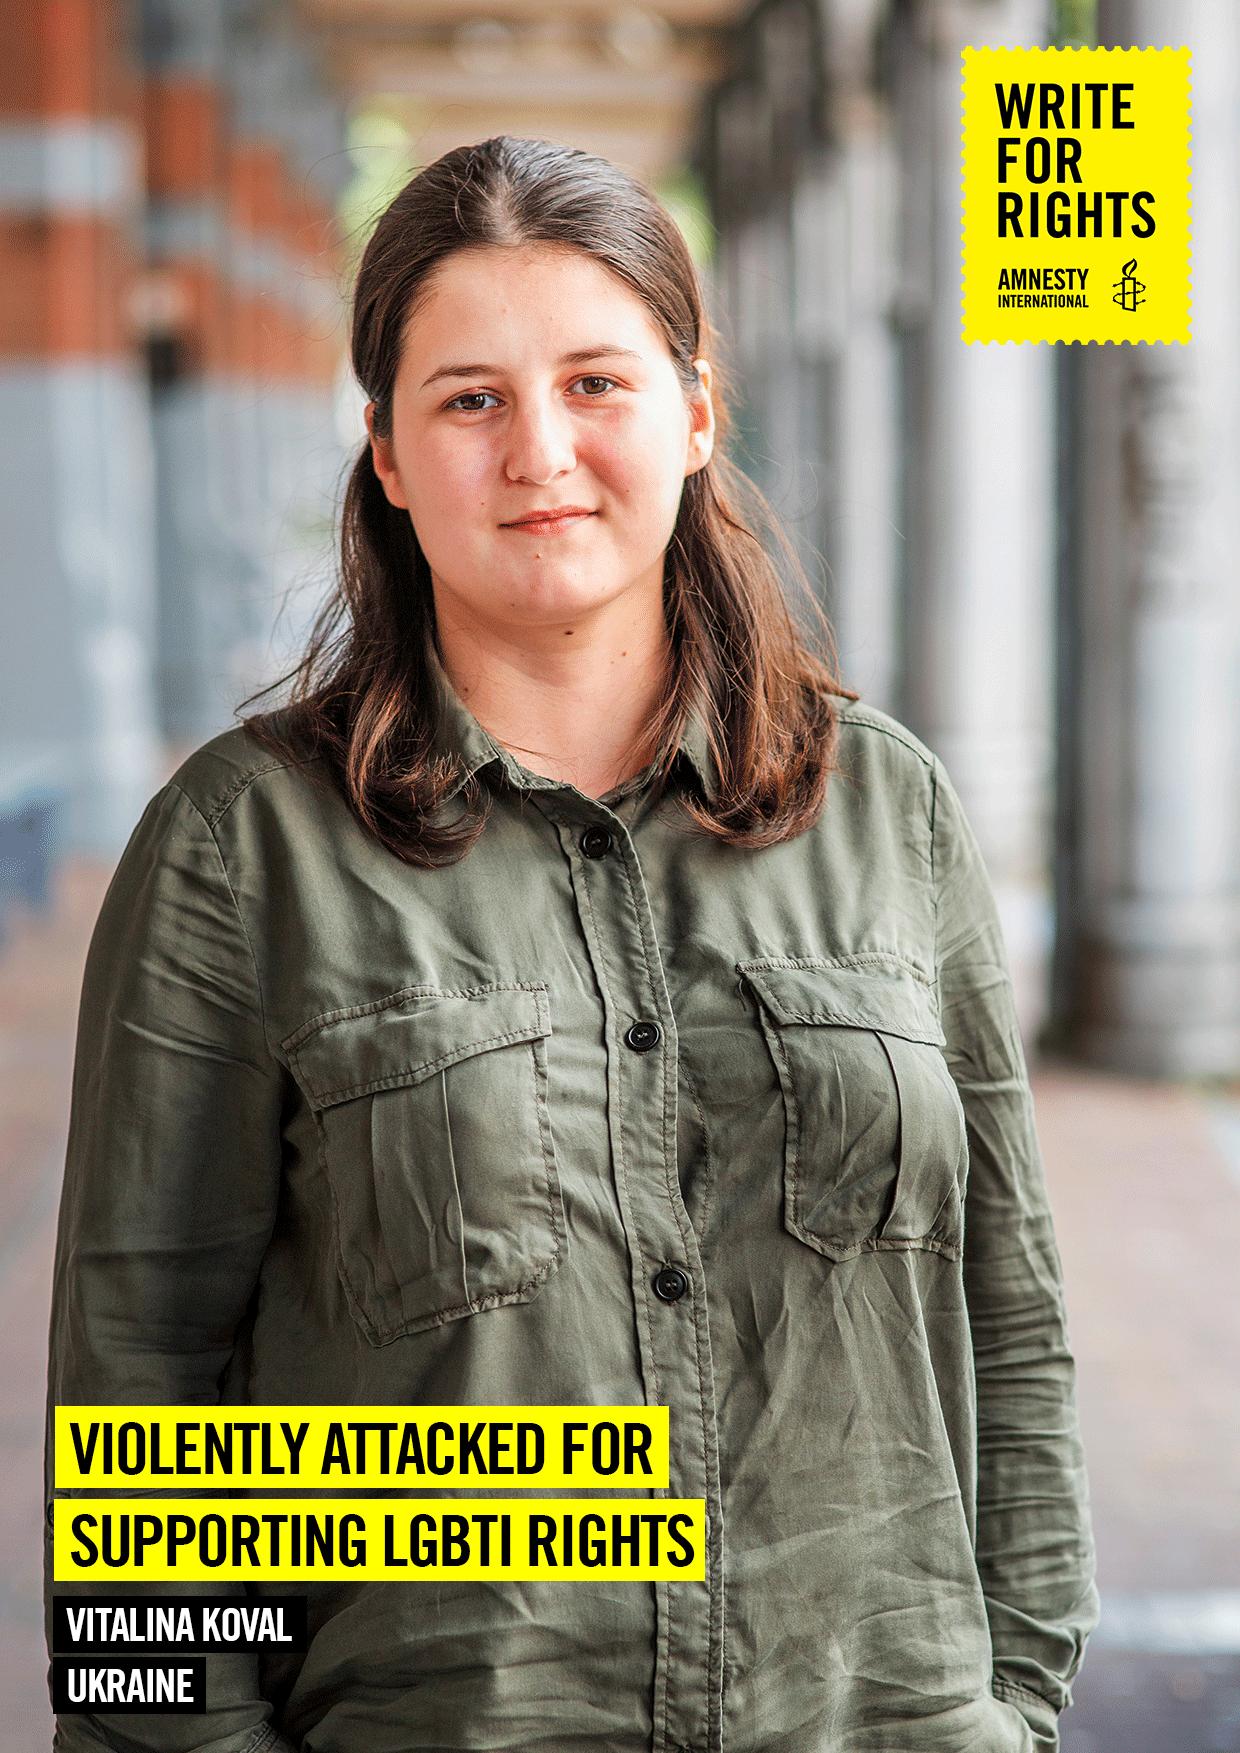 UKRAINE: VITALINA KOVAL